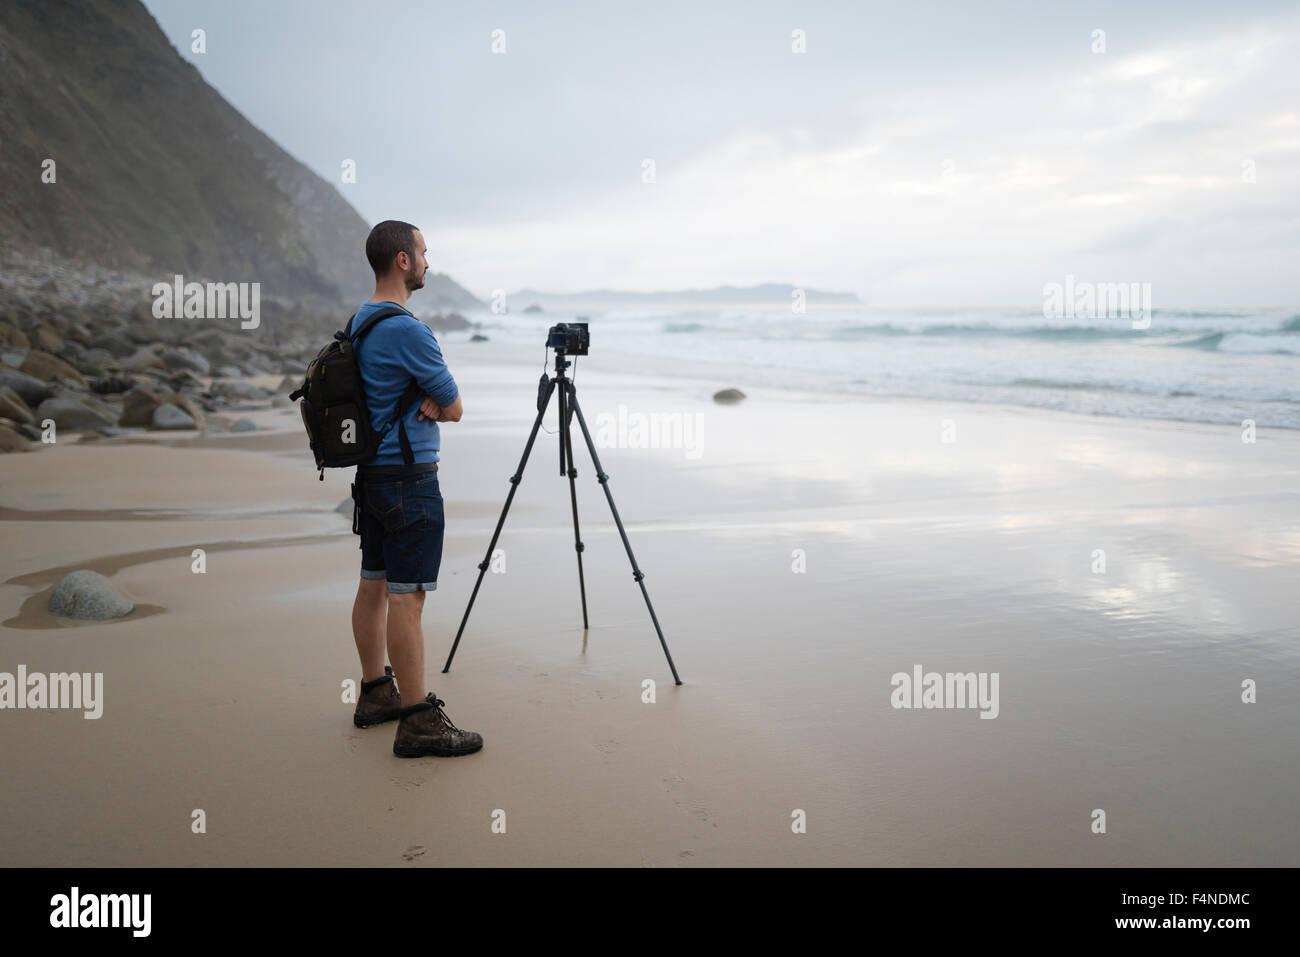 Spain, Valdovino, photographer standing on the beach taking photos with a tripod Stock Photo